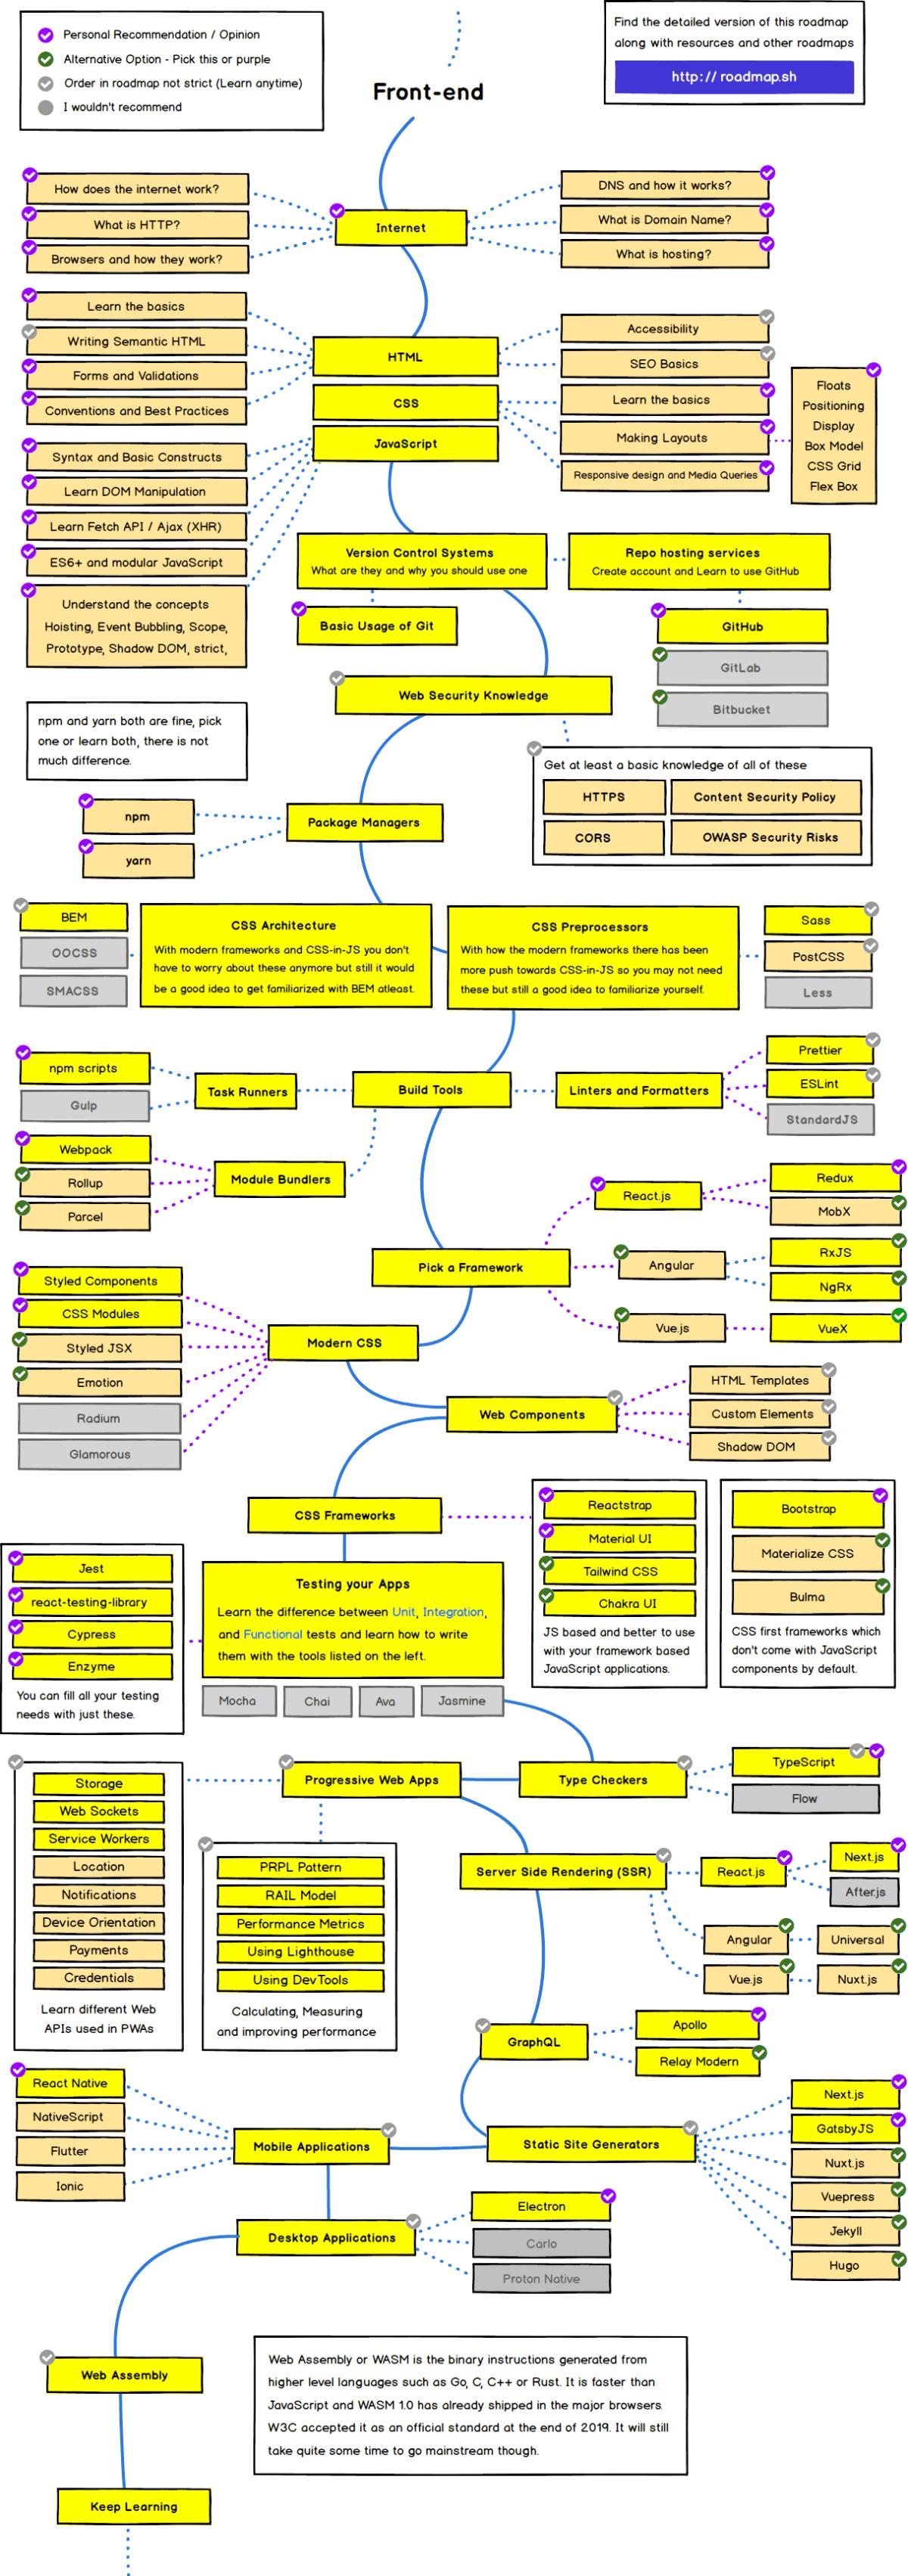 Developer Frontend roadmap 2021